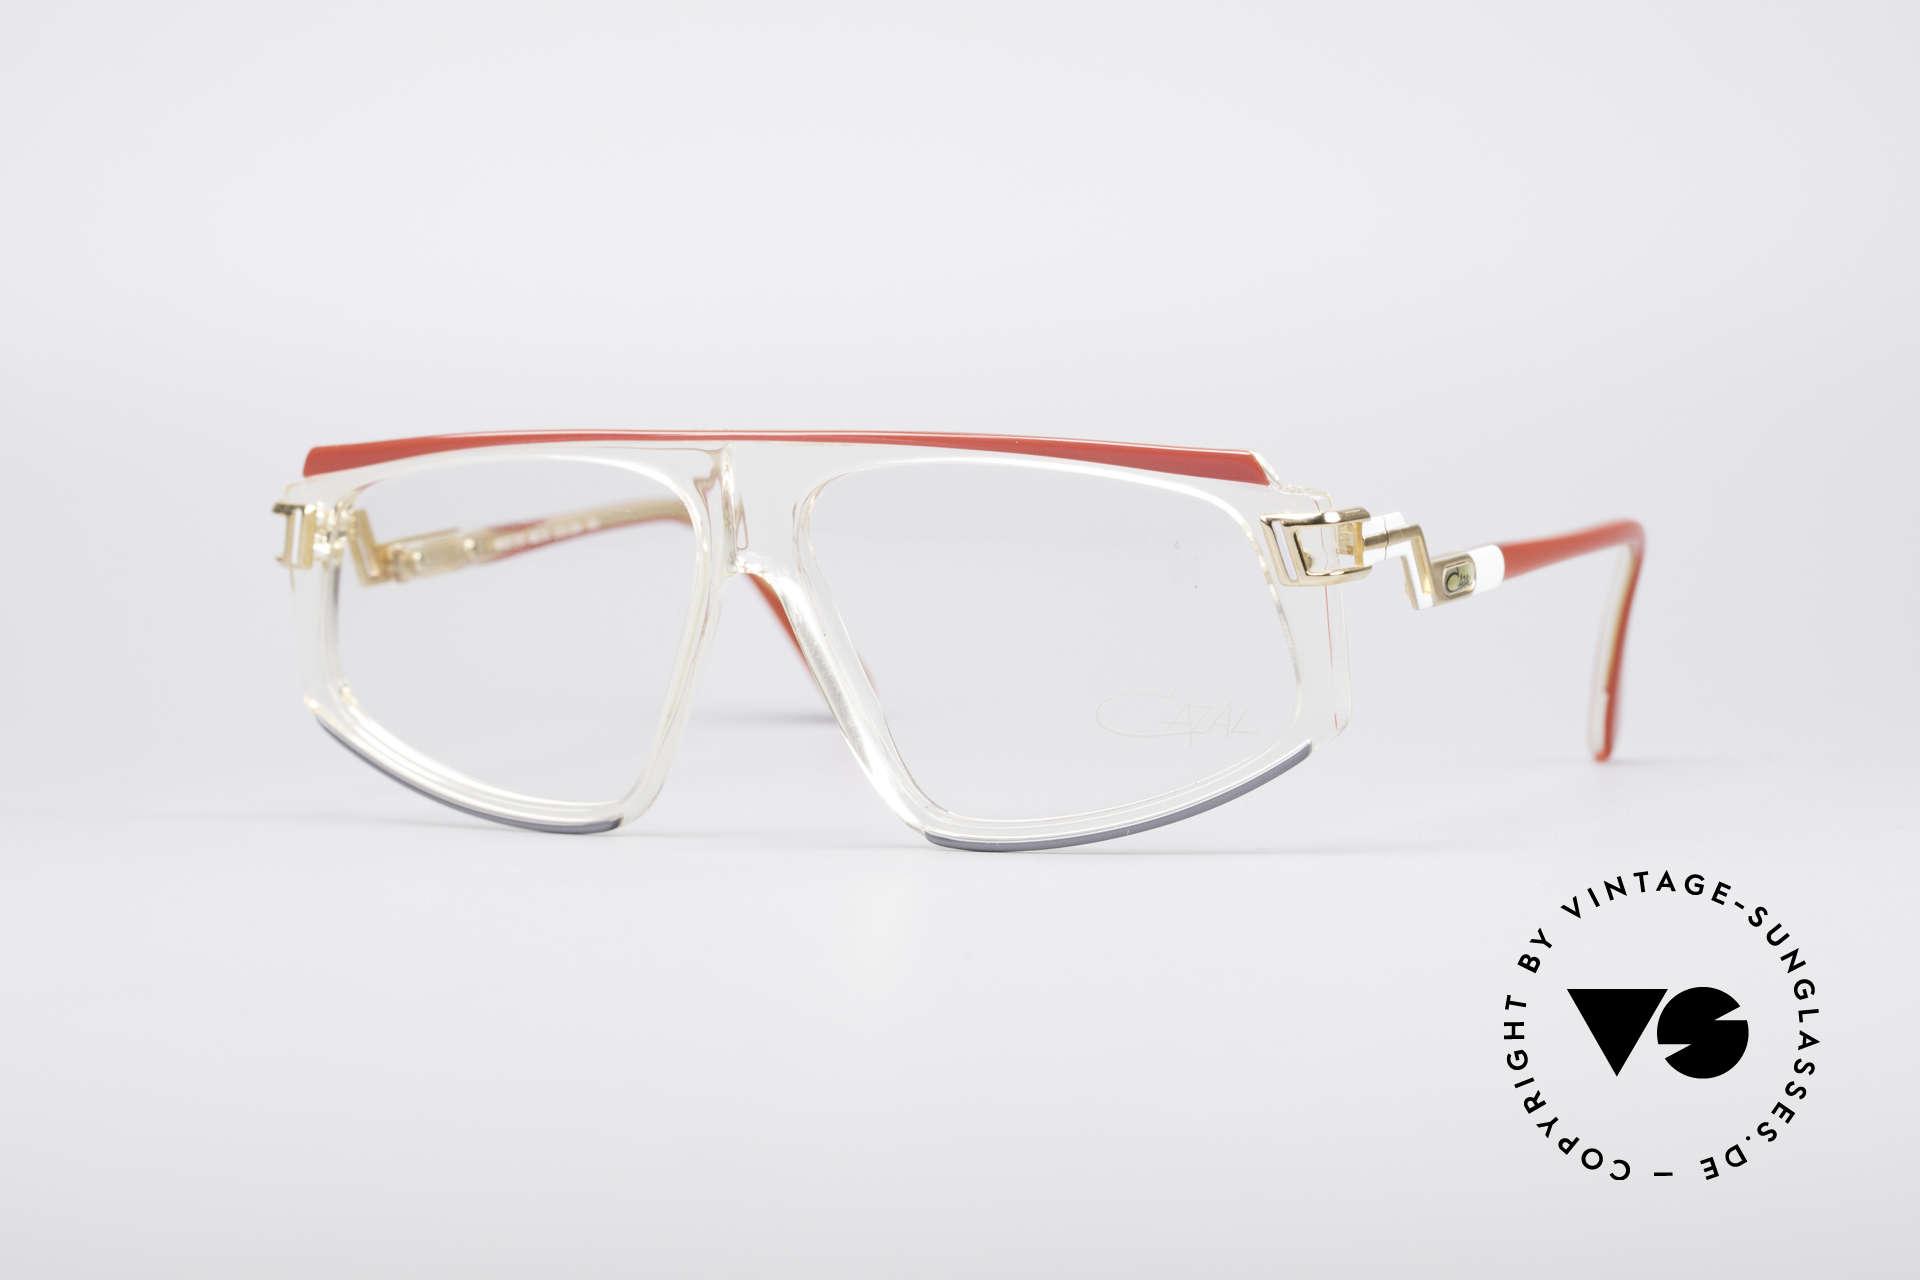 Cazal 170 True Vintage No Retro Glasses, rare vintage eyeglasses by Cari Zalloni (CAZAL), Made for Women